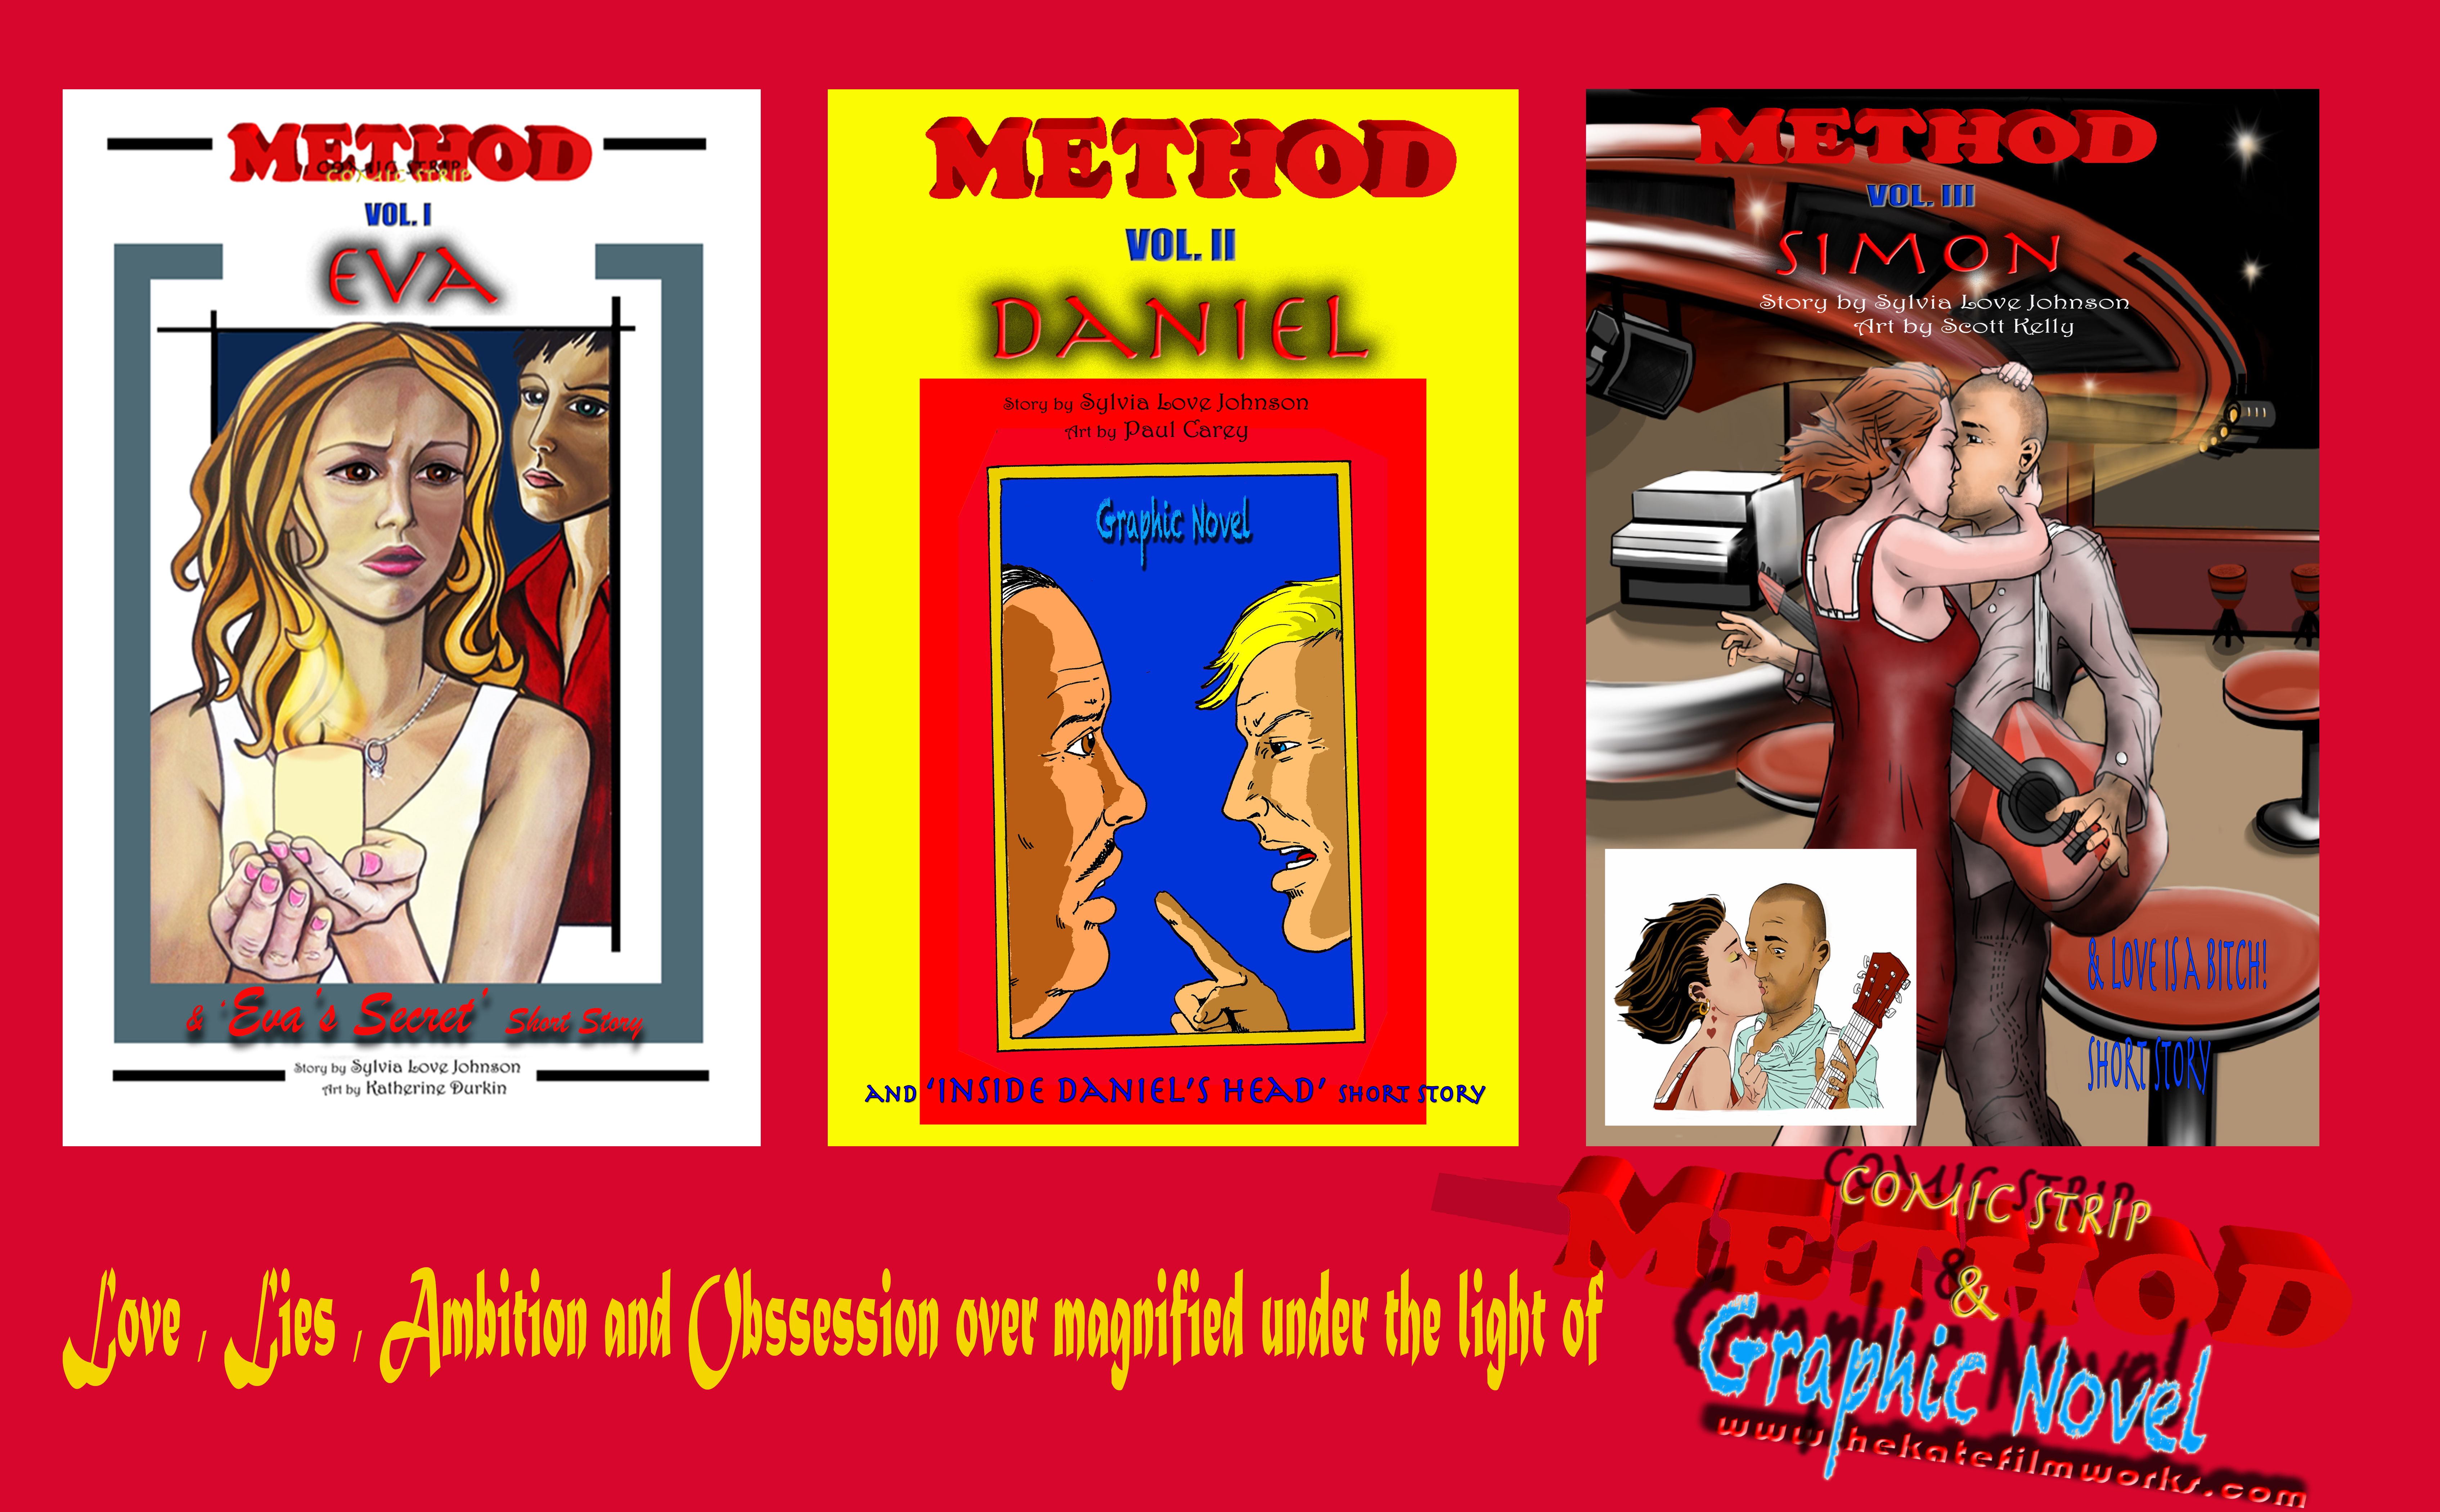 METHOD Graphic Novel Series